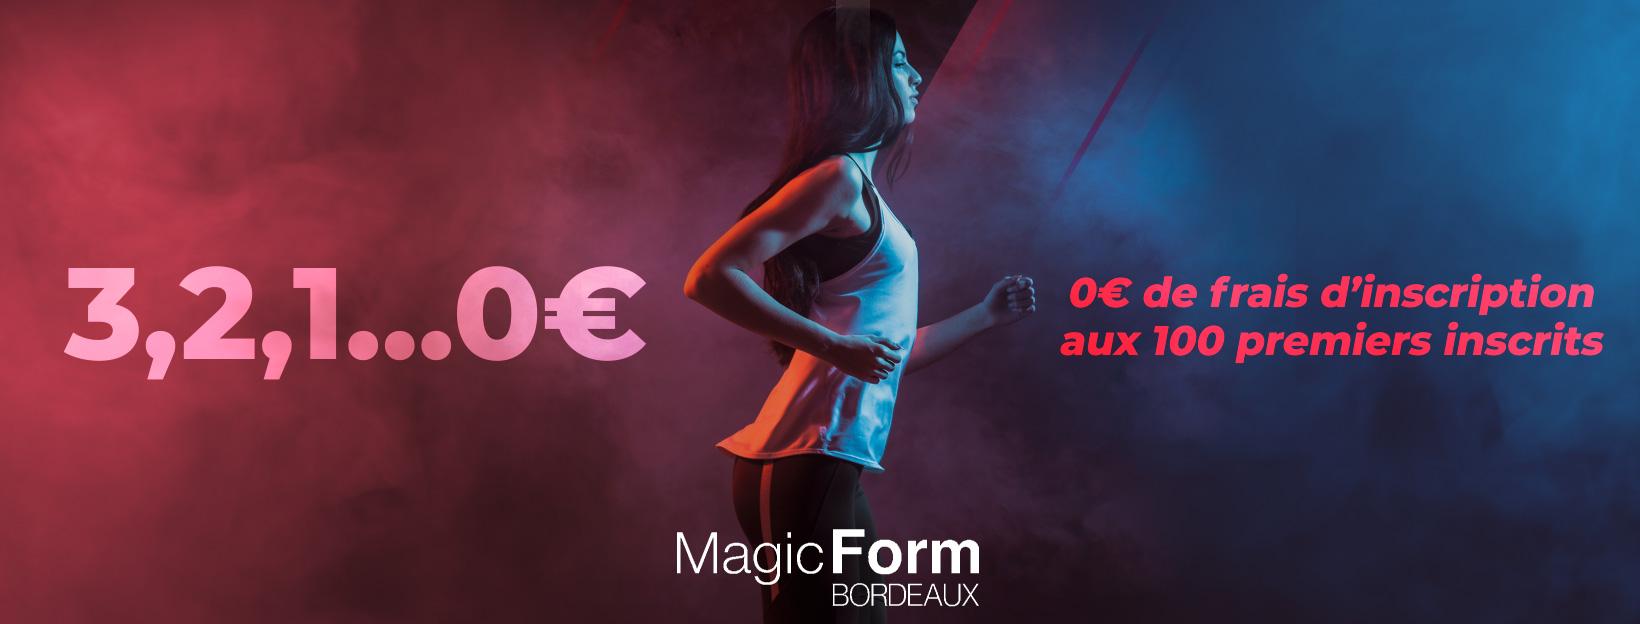 promo-septembre-2020_magicform-bordeaux